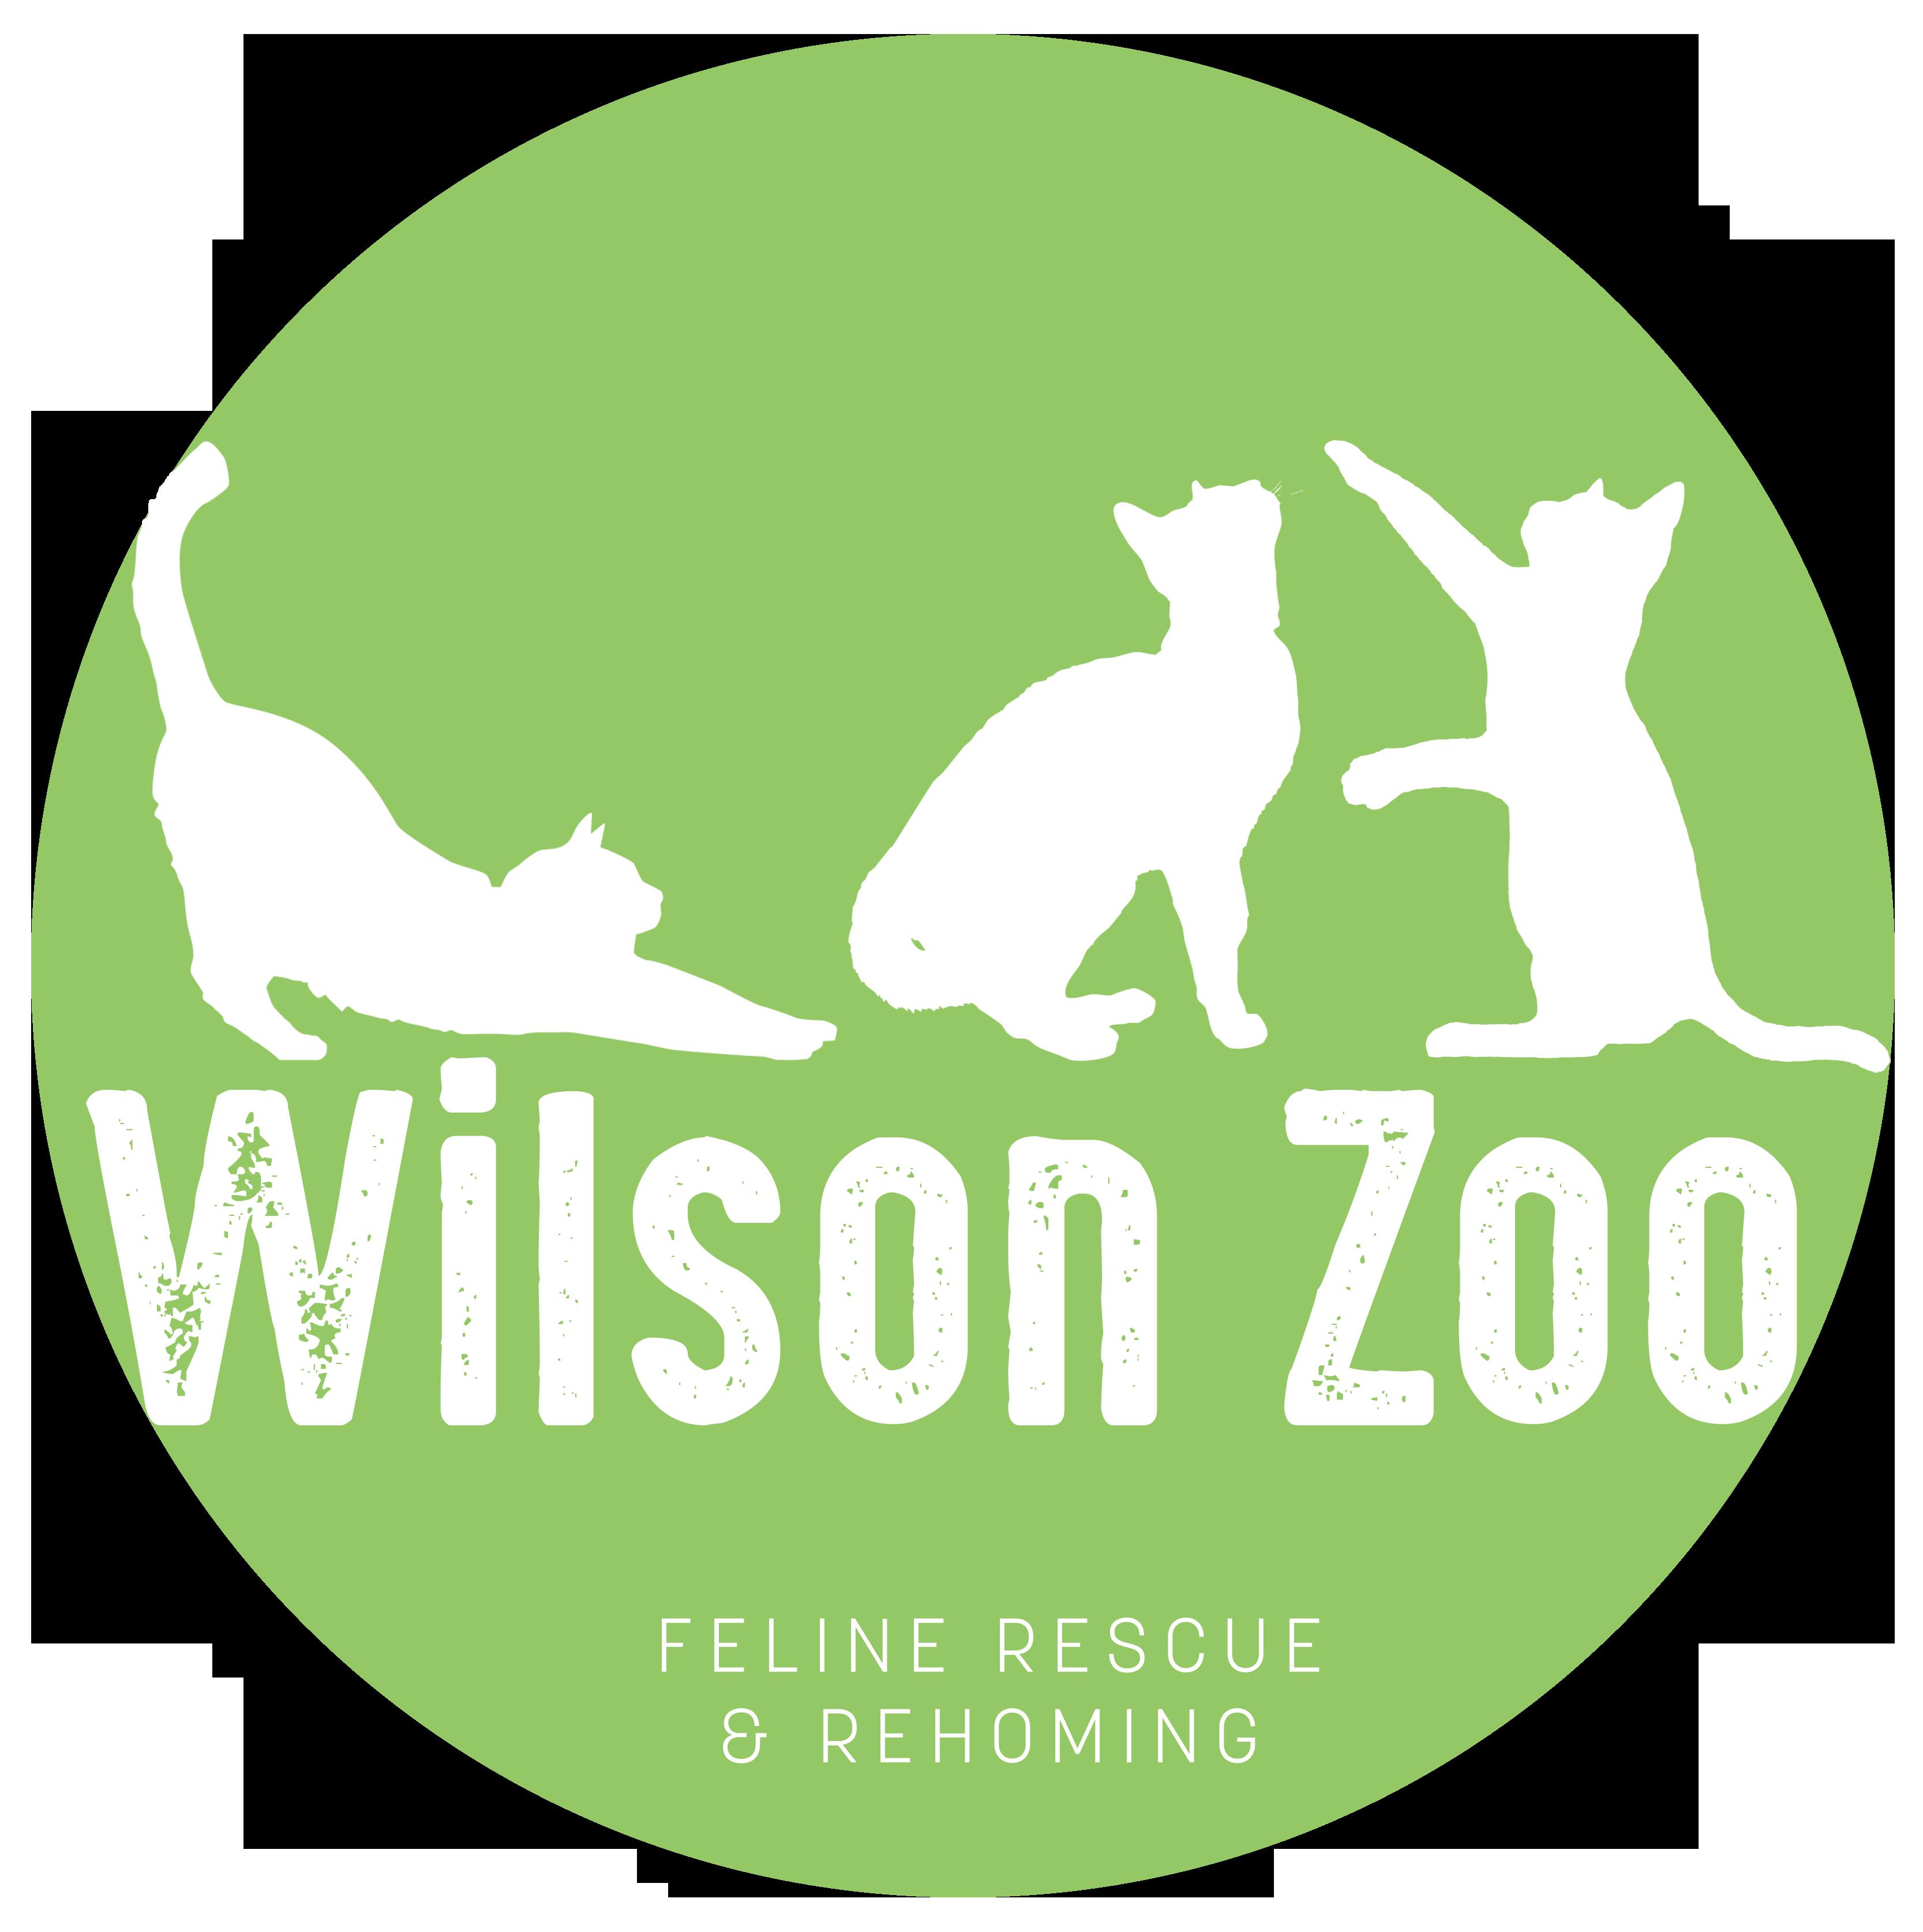 Wilson Zoo